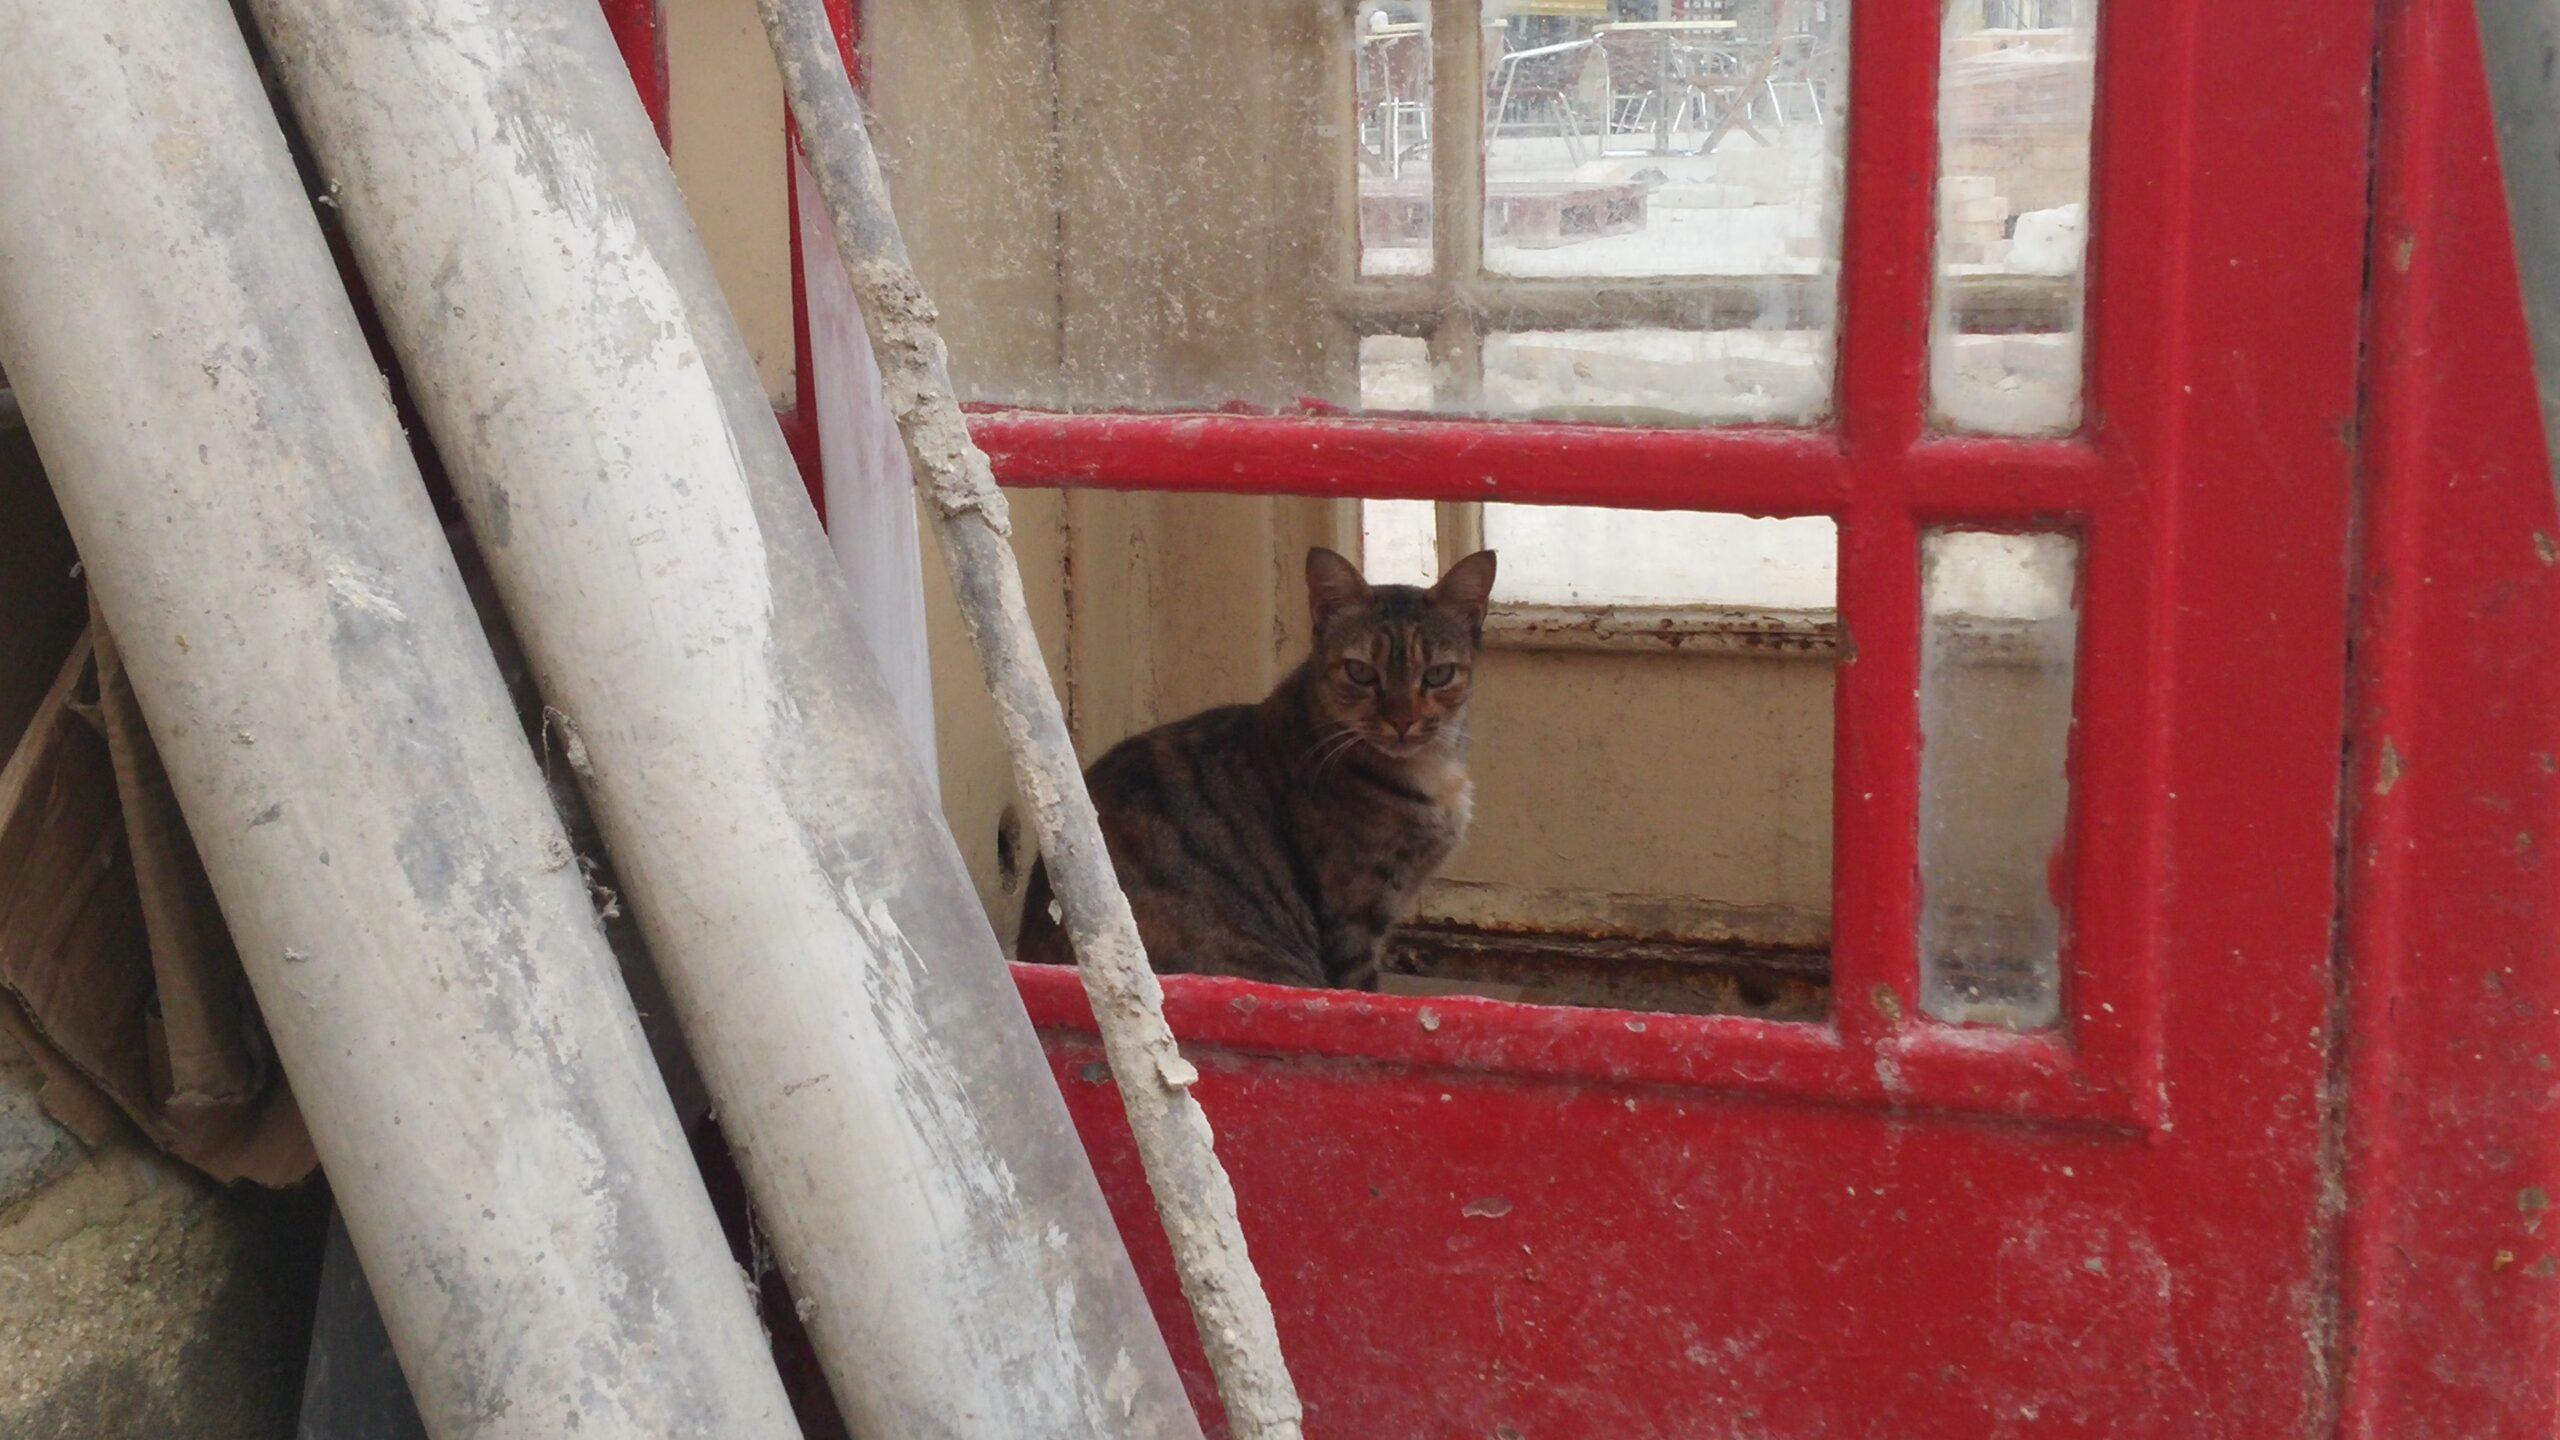 cats are everywhere in Malta